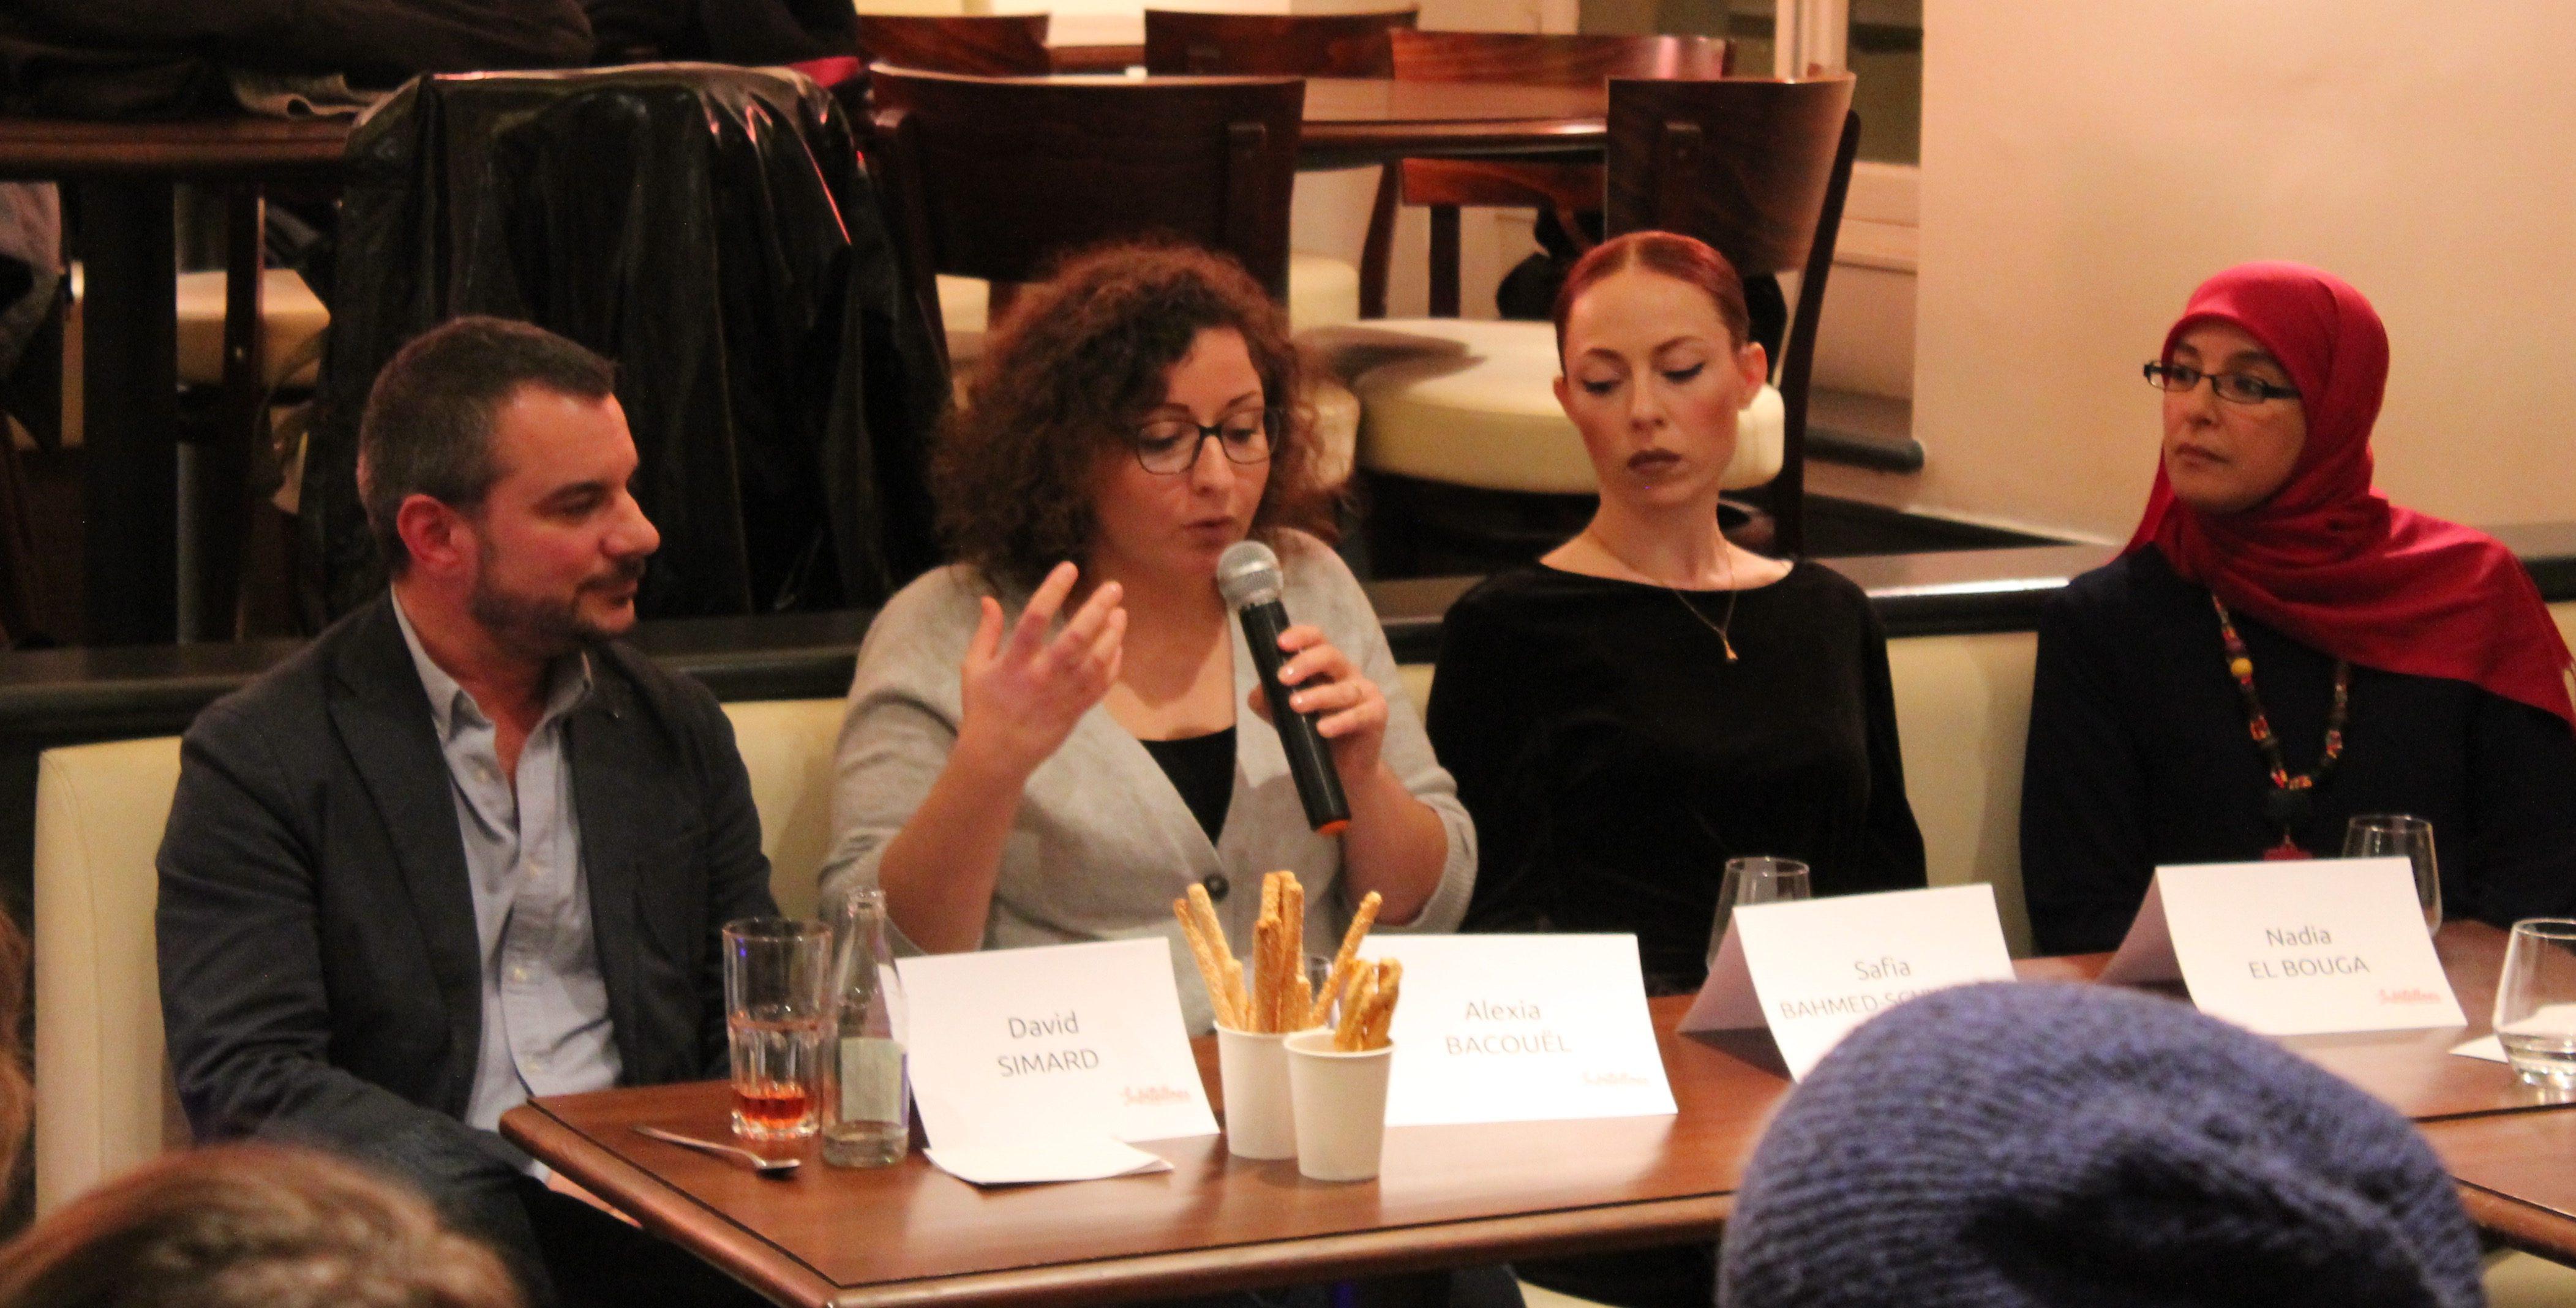 De gauche à droite: David Simard, Alexia Bacouël, Safia Bahmed Schwartz et Nadia El Bouga